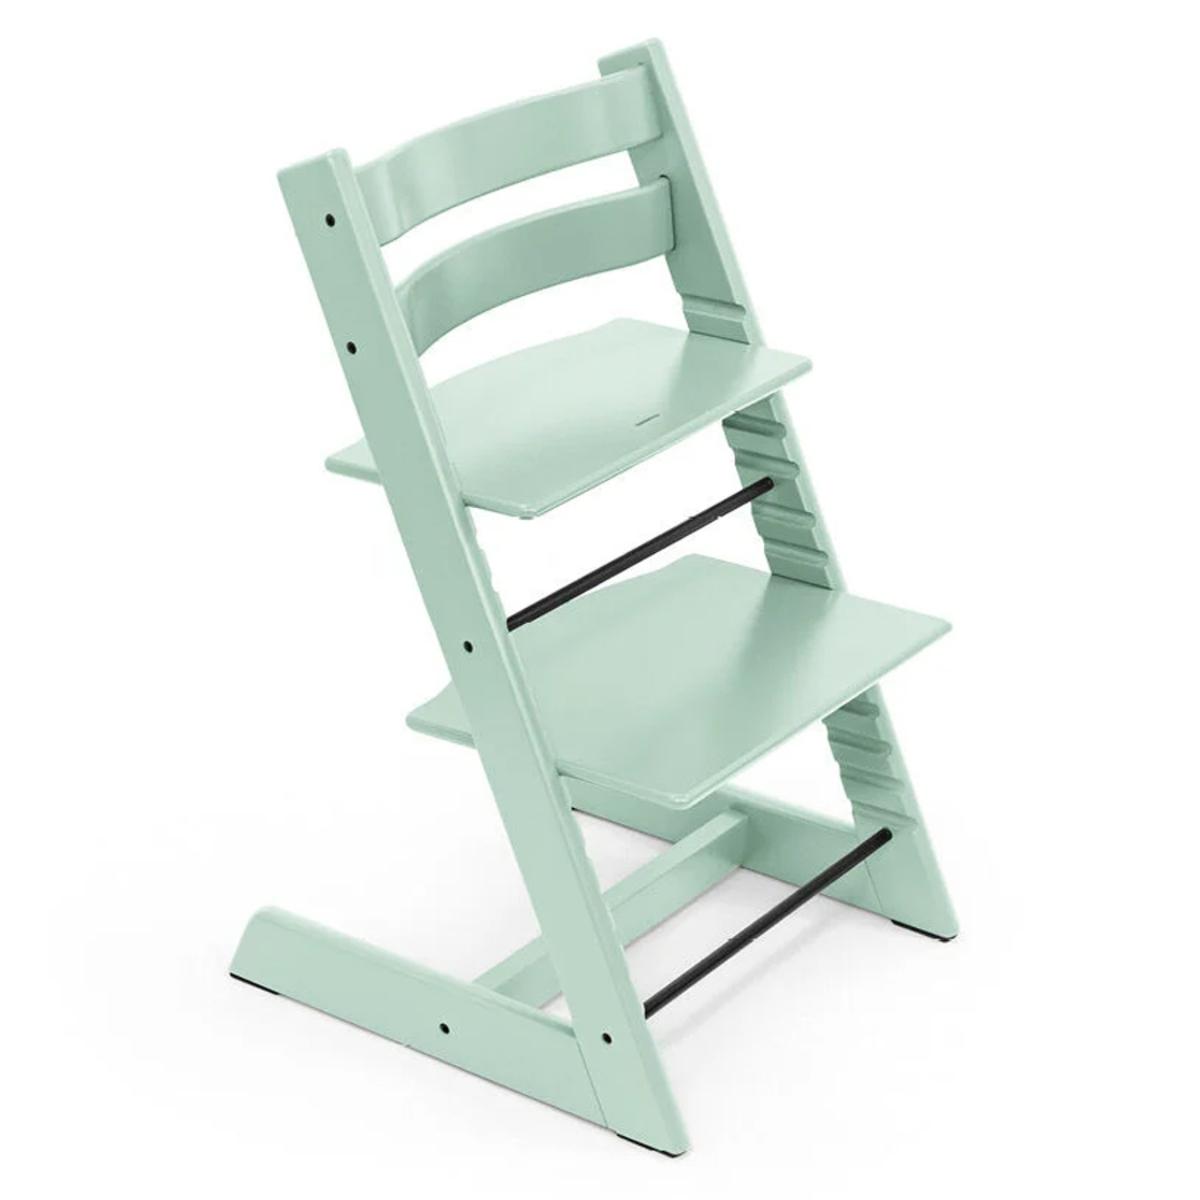 Chaise haute Chaise Haute Tripp Trapp - Vert Menthe Chaise Haute Tripp Trapp - Vert Menthe